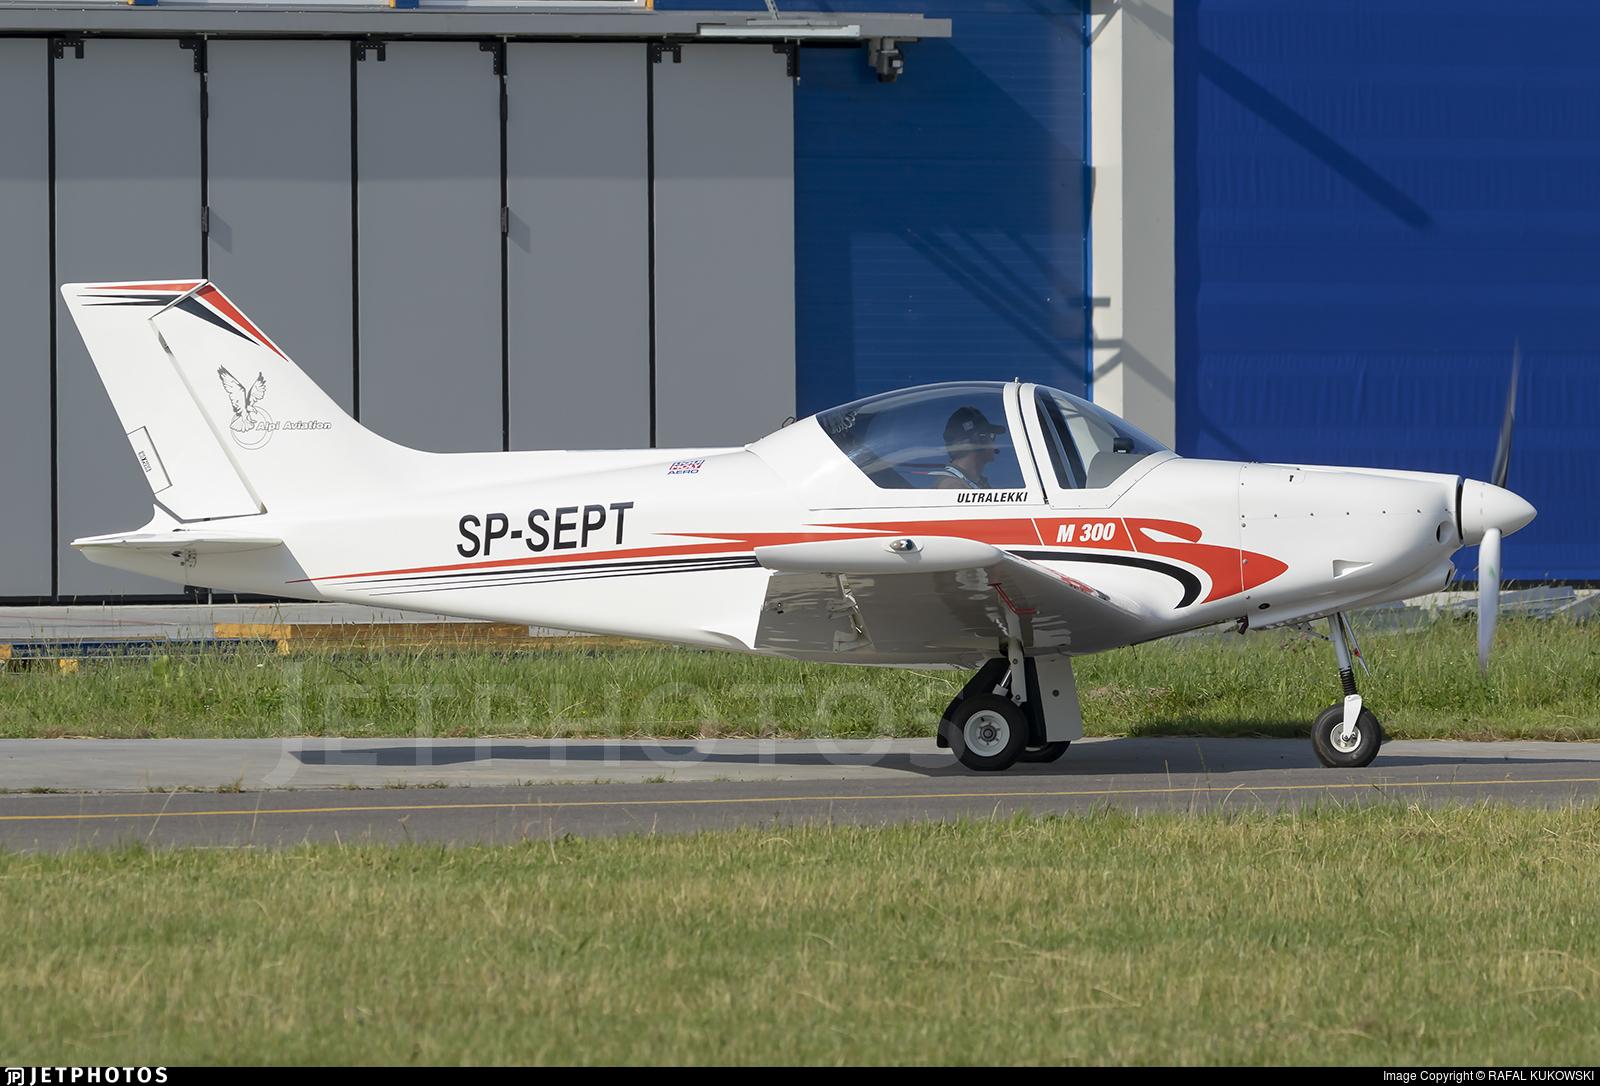 SP-SEPT - Alpi Pioneer 300 - Private